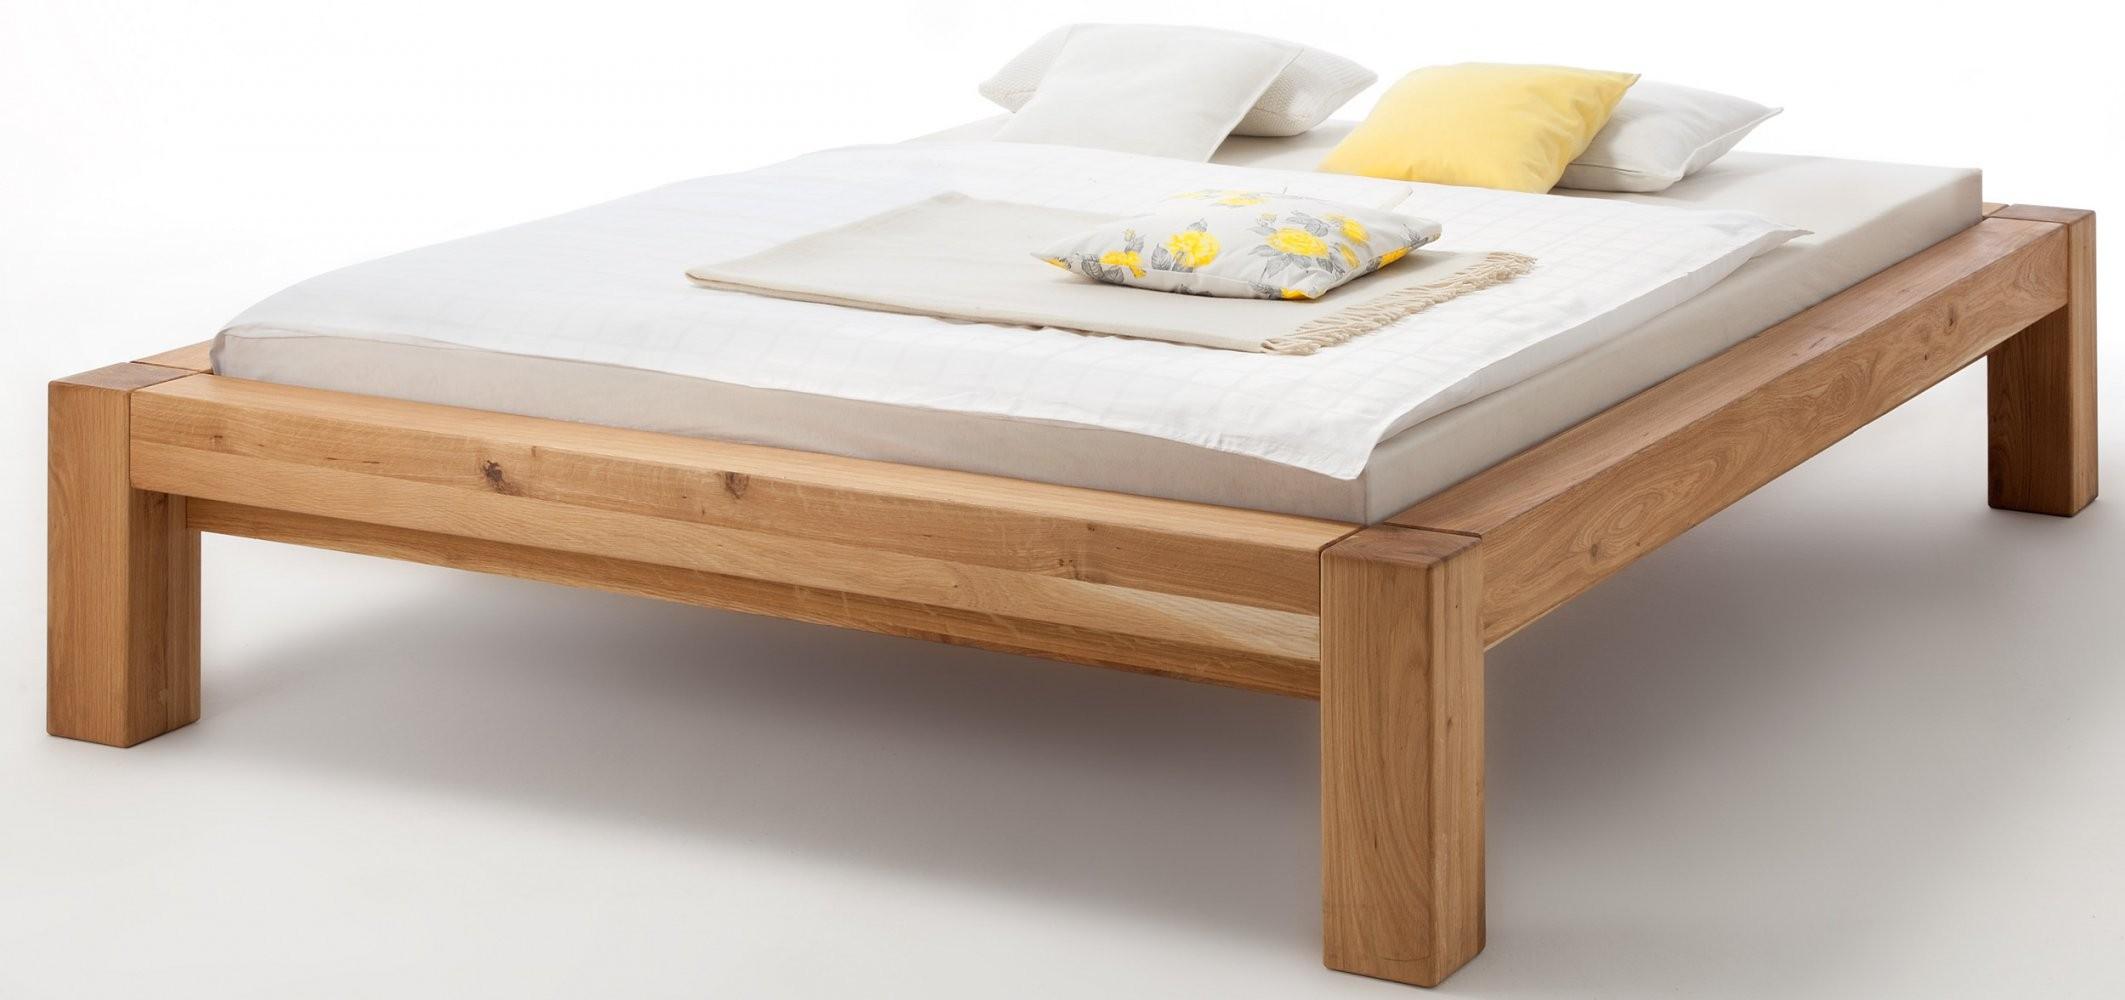 Bettgestell 140X200 Holz Beste Bett Massiv Massivholzbett Buche von Bettgestell 160X200 Holz Photo